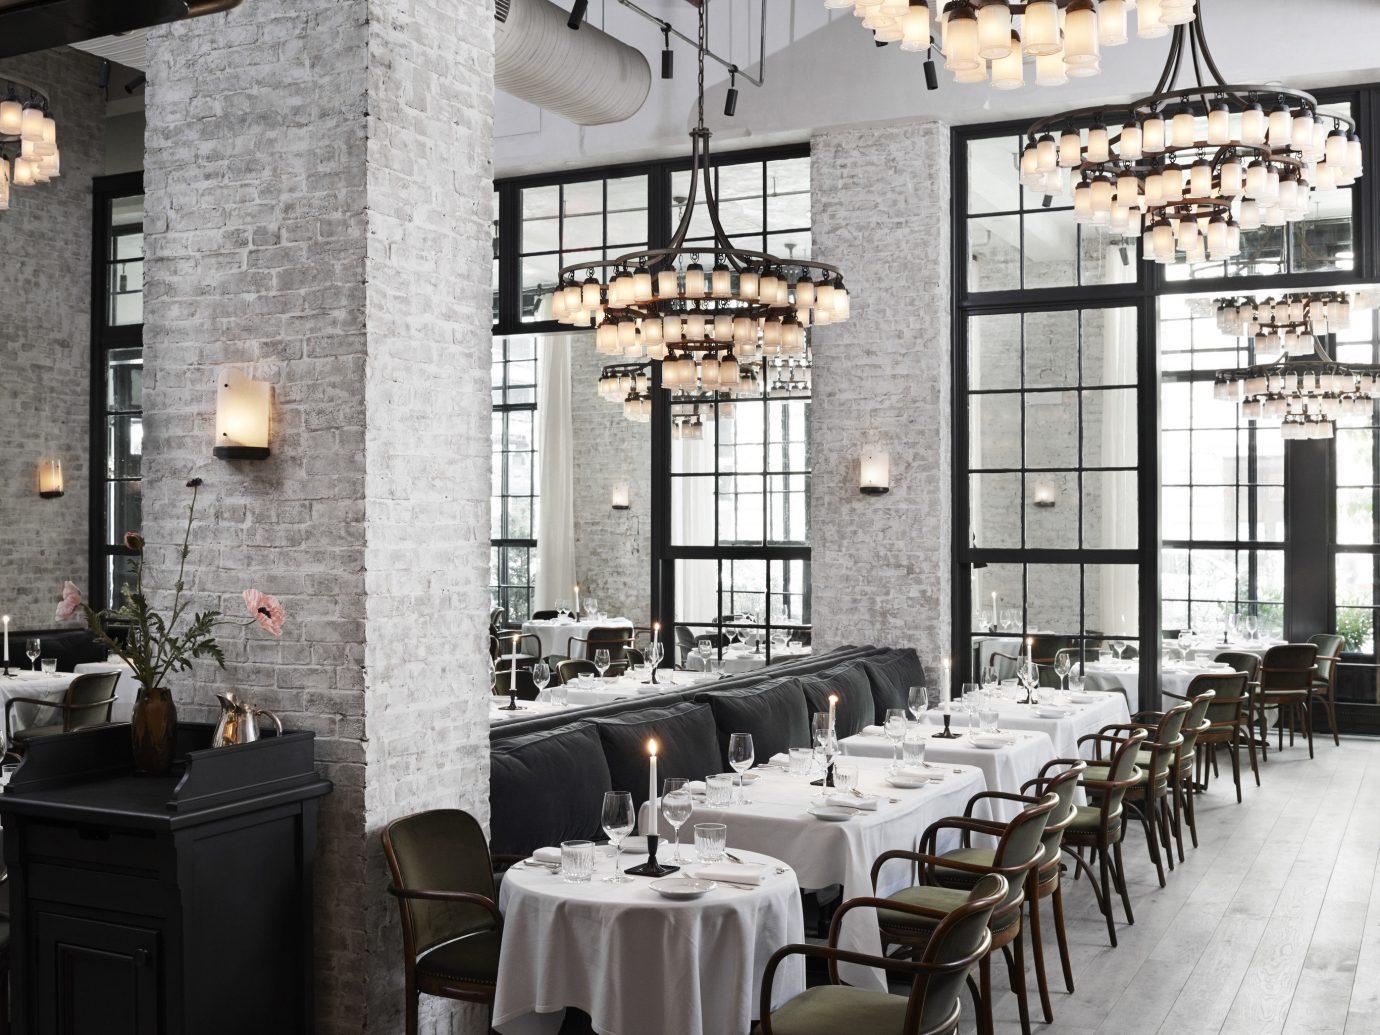 Food + Drink Romance indoor room restaurant meal interior design aisle furniture several dining room